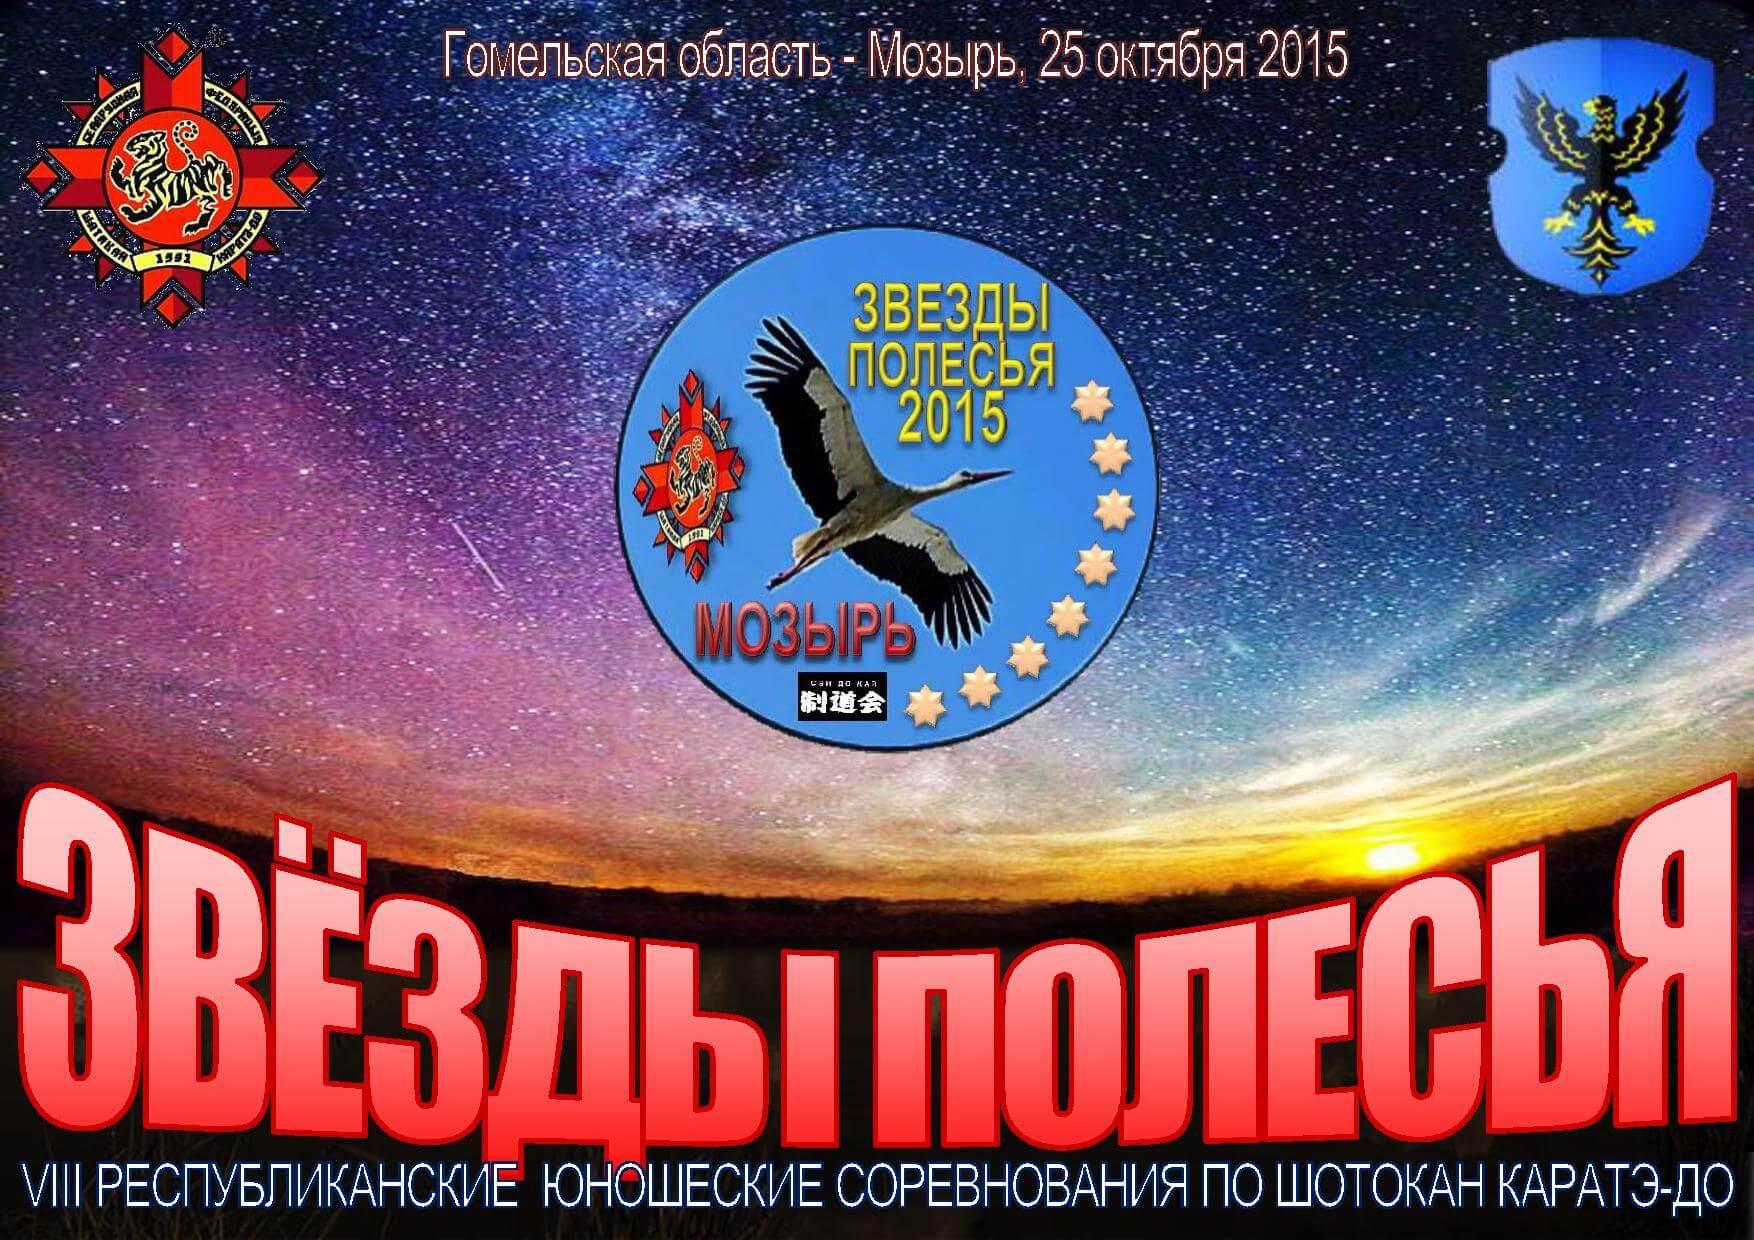 Мозырь-2015 Постер